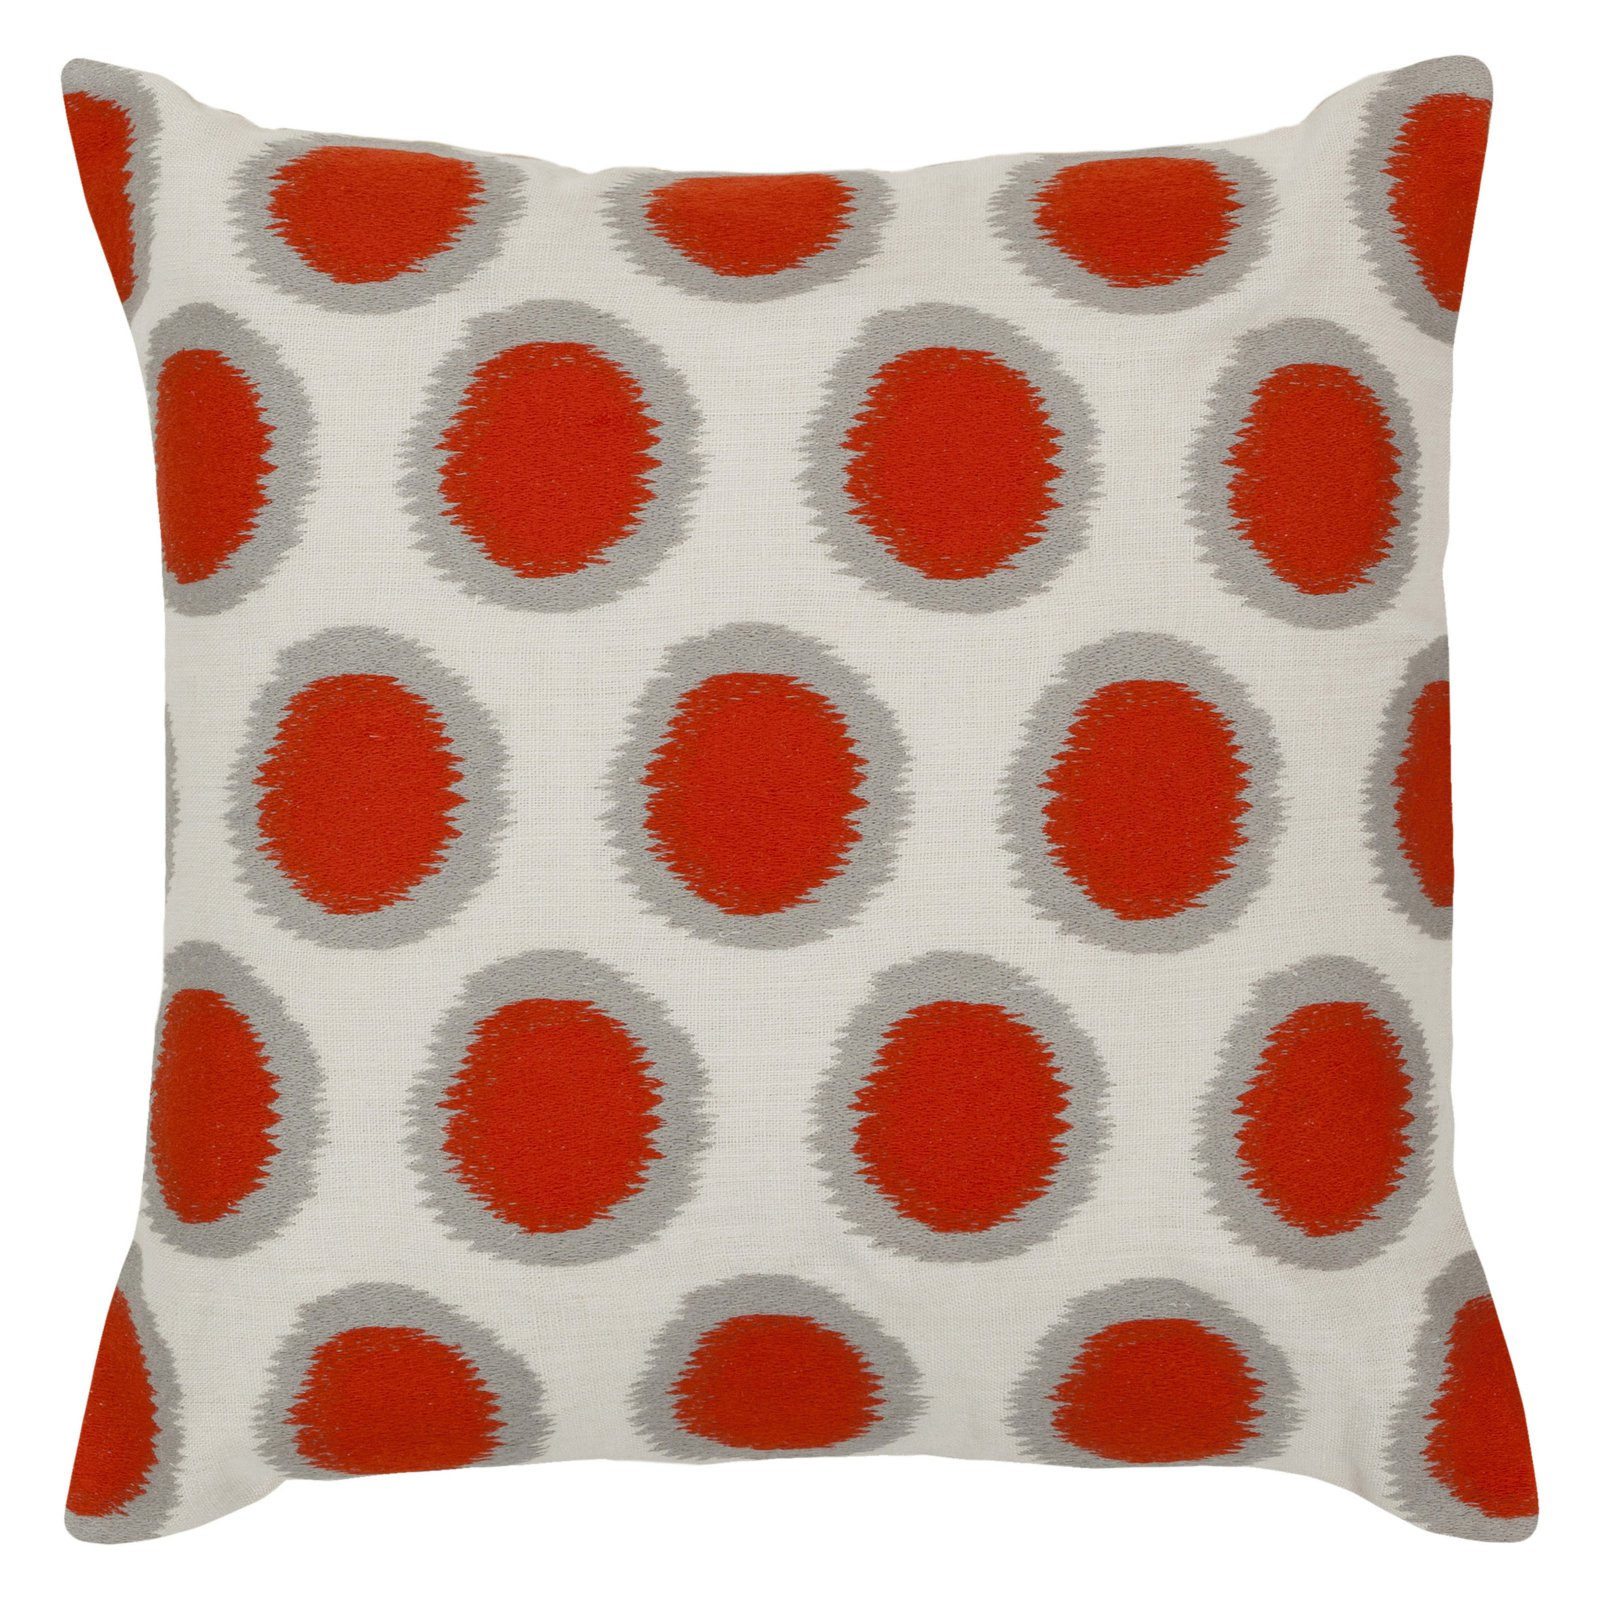 Surya Surya Pillows Area Rugs - AR091 Contemporary Papyrus/Limeade Polka Dot Rings Circles Rug